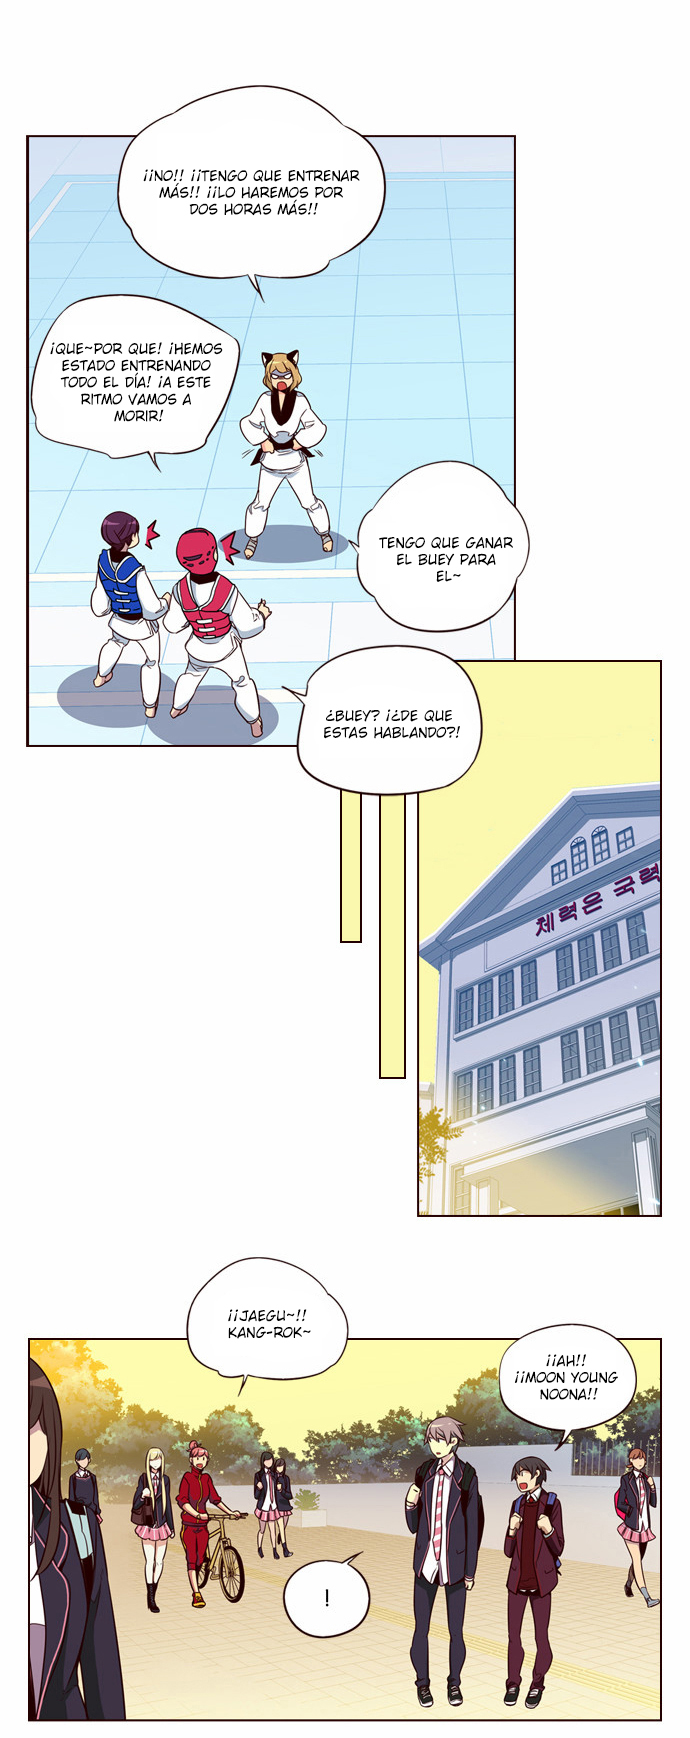 http://c5.ninemanga.com/es_manga/32/416/396832/4ece9275b9d42ce752f8cf90a1f713f8.jpg Page 10